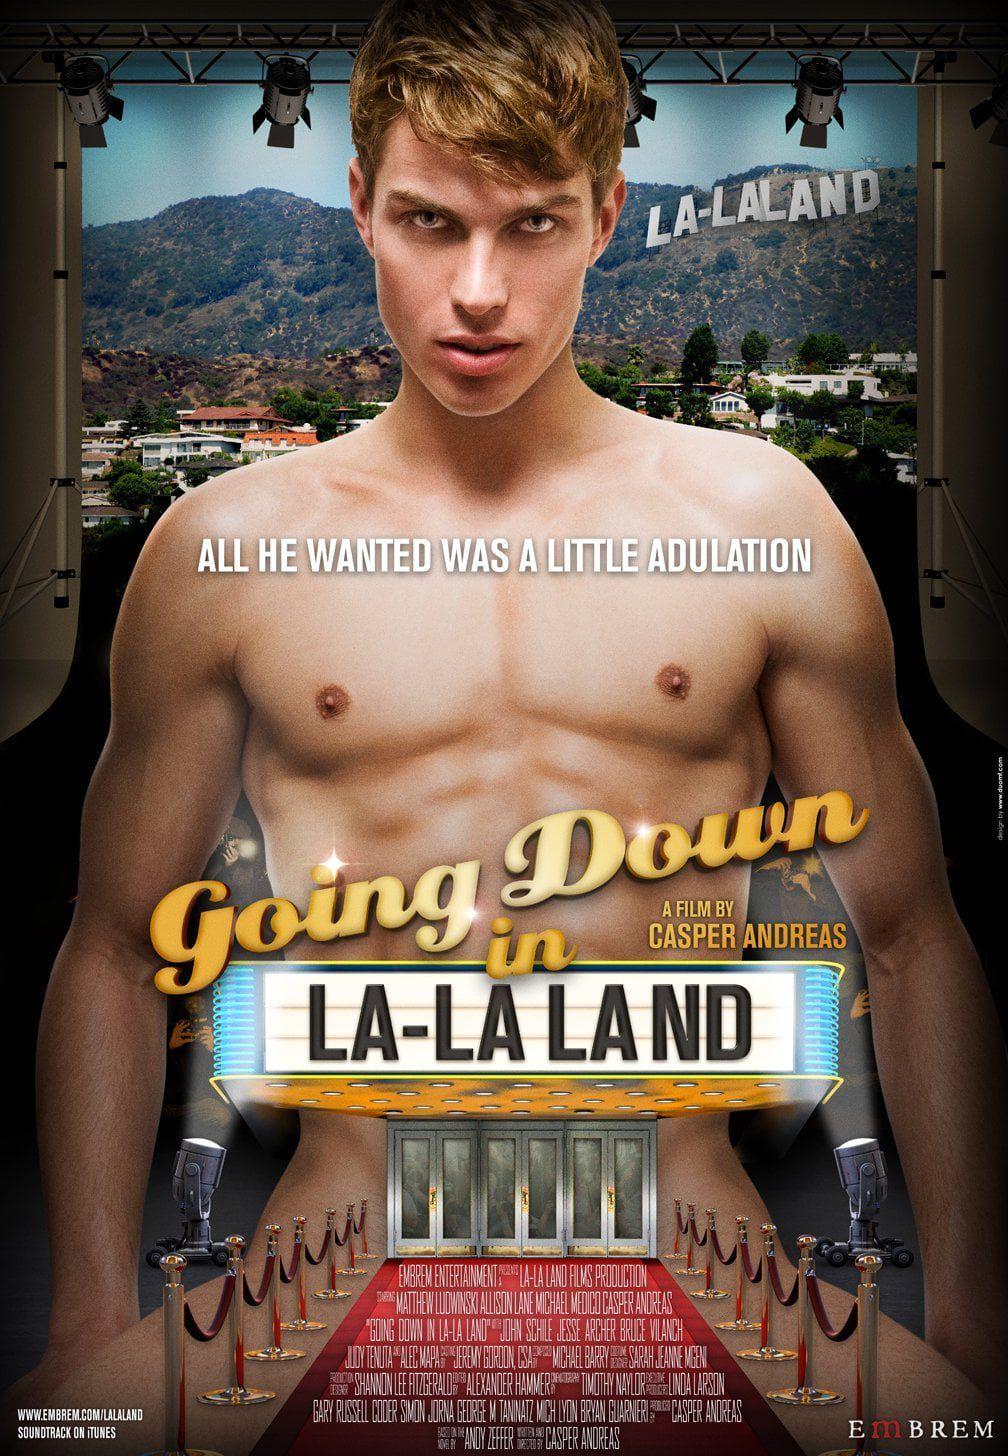 Going Down in LA-LA Land - Film (2011)